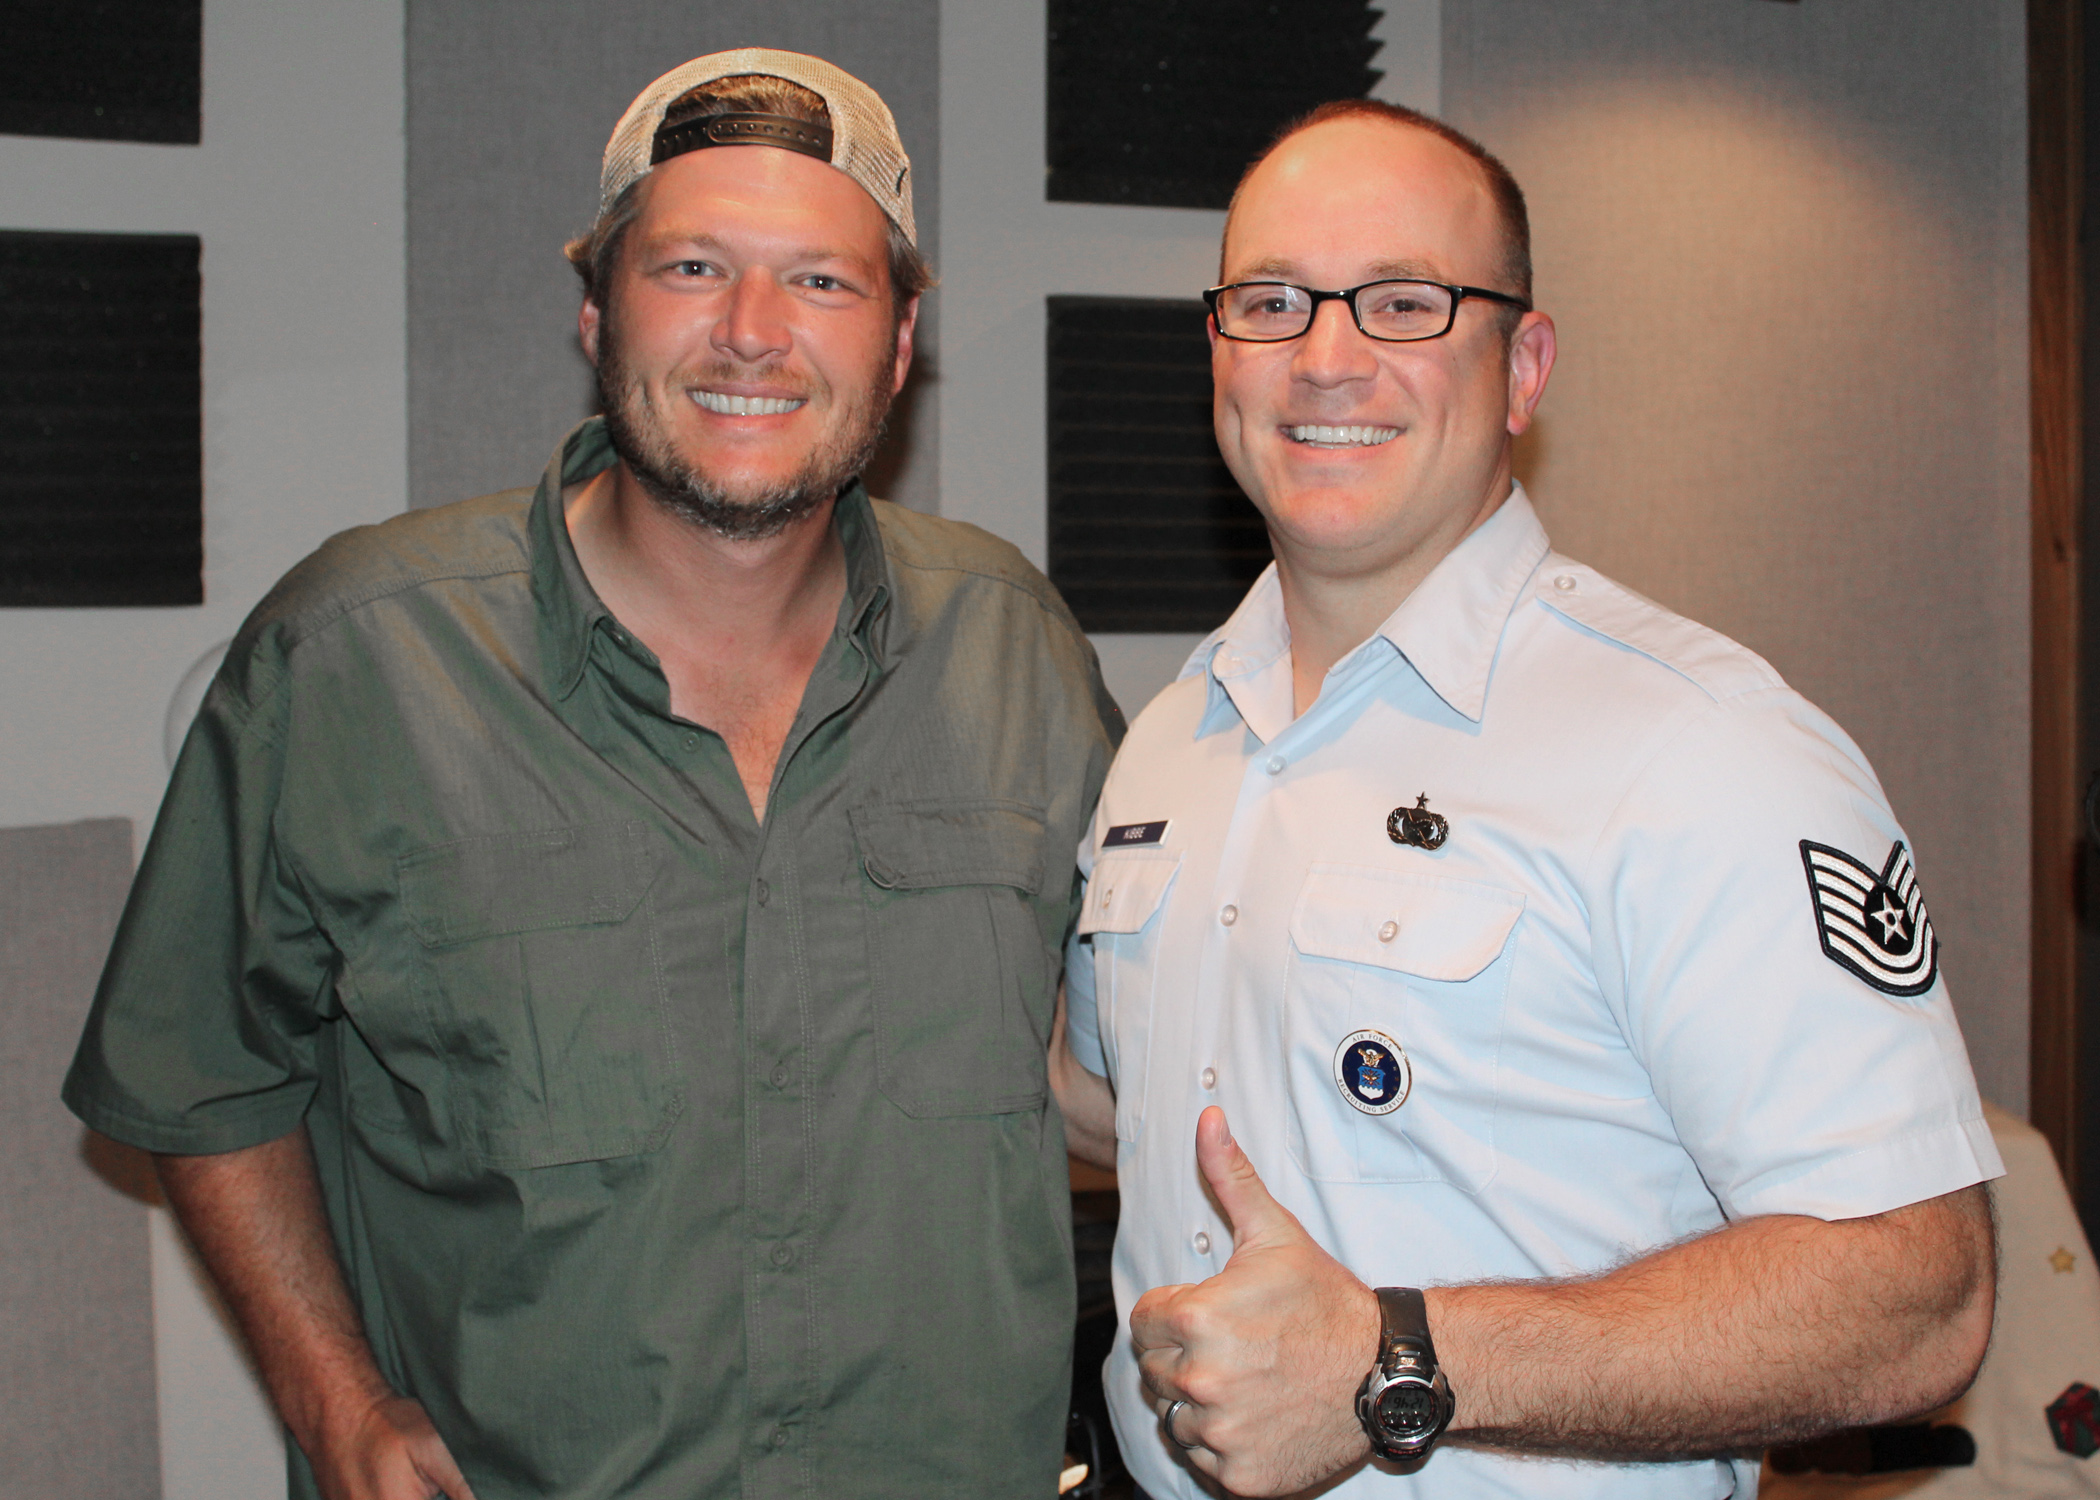 blake shelton lends voice to holiday program - Country Christmas Radio